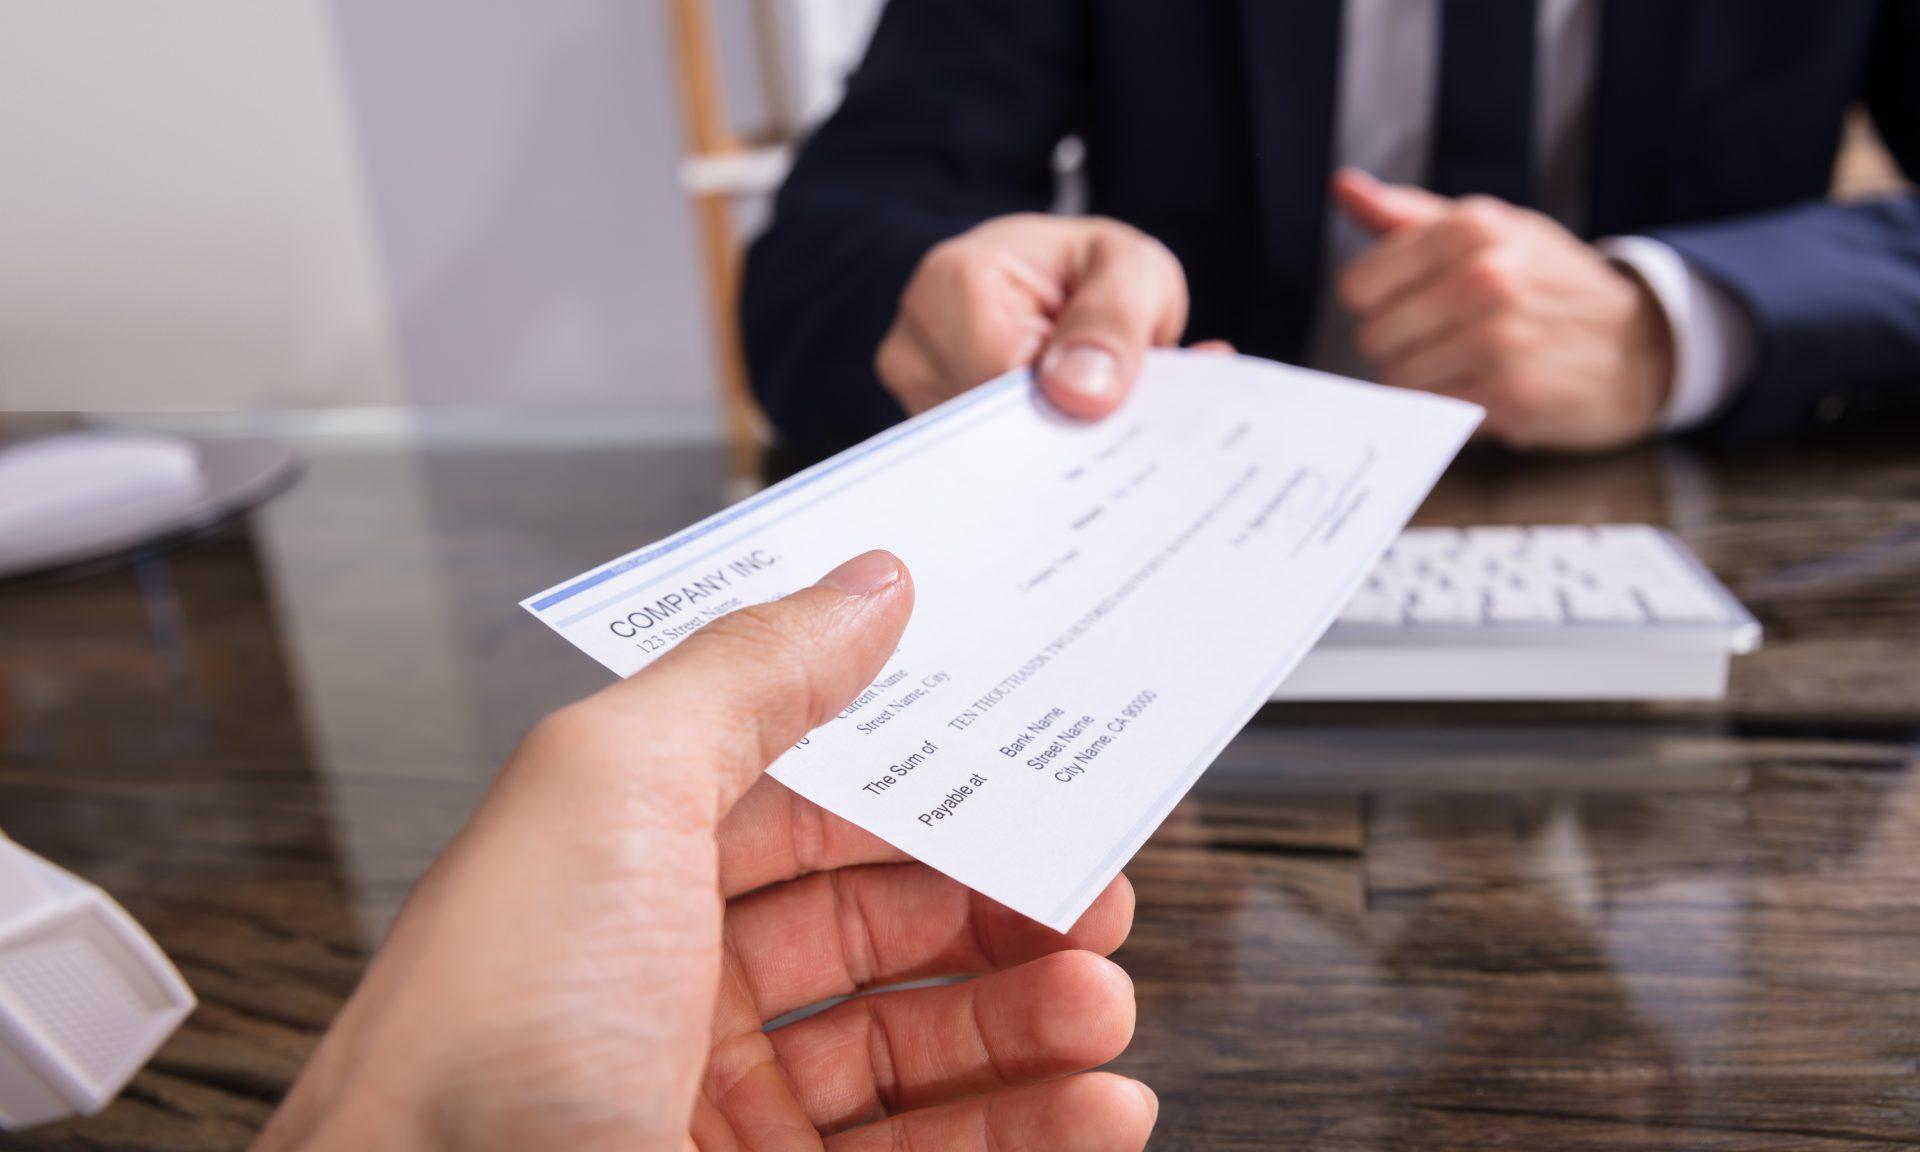 The single check